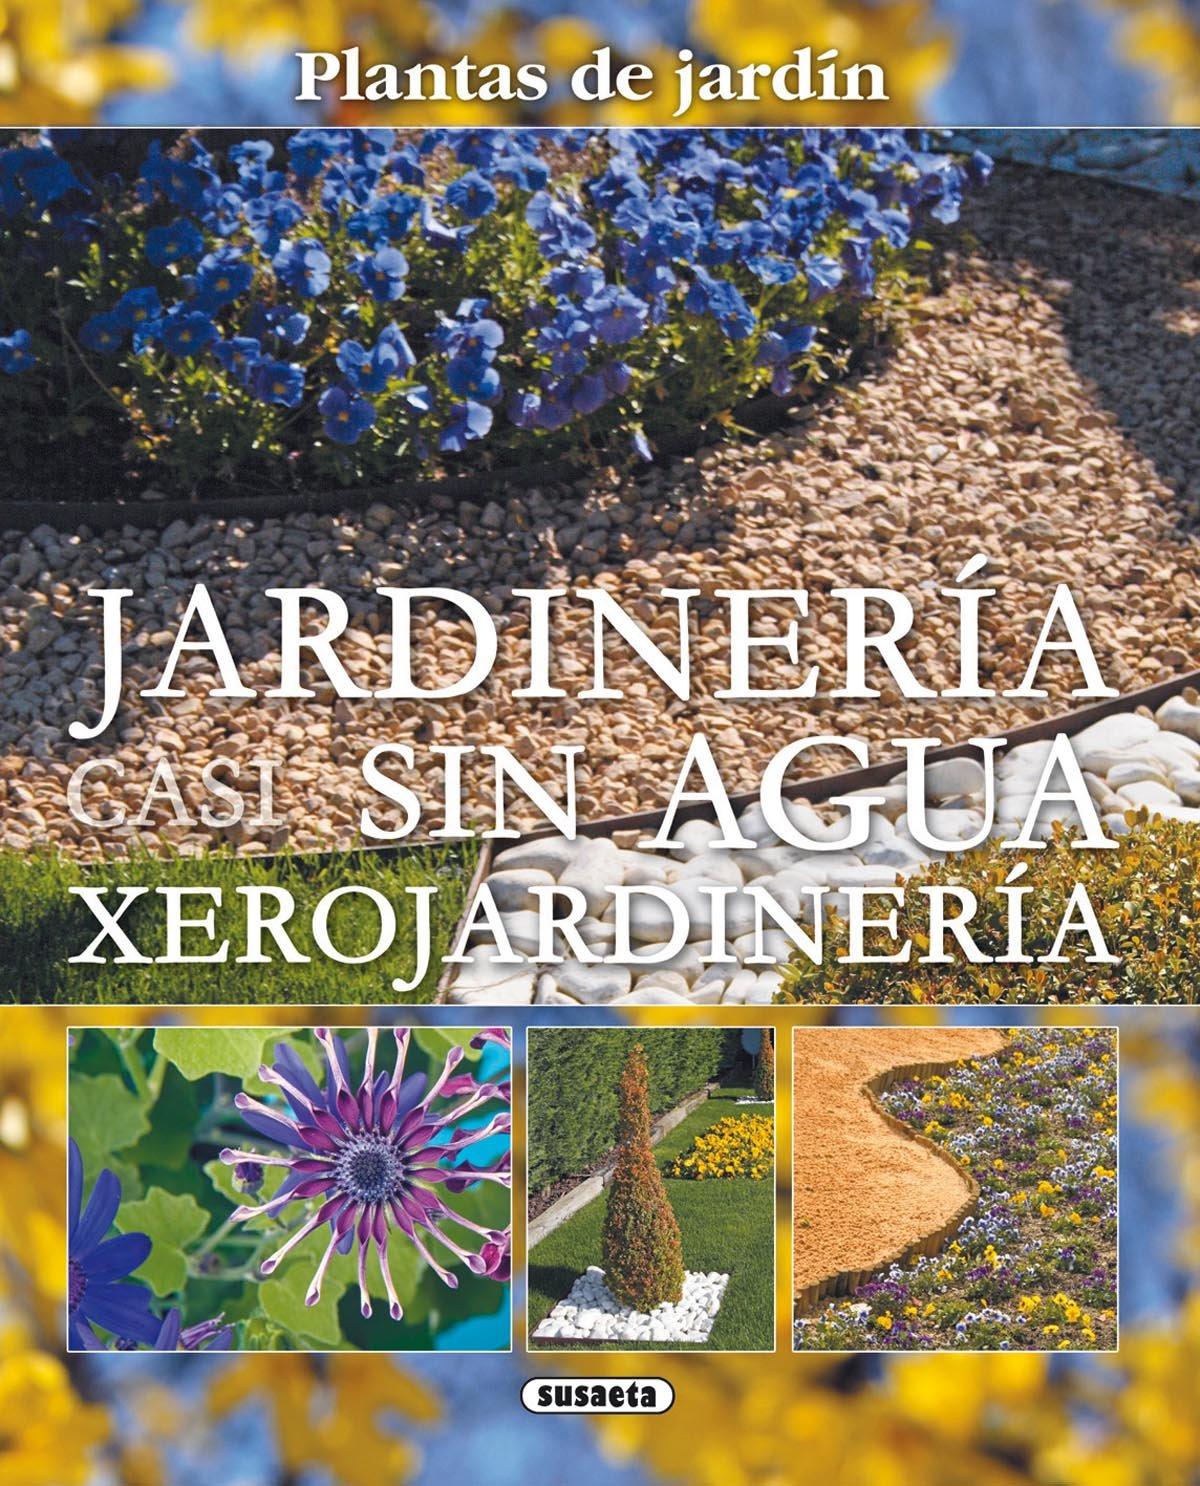 Jardineria sin agua: Xerojardineria (Plantas de Jardin) (Spanish Edition)  (Spanish) Paperback – April 1, 2011